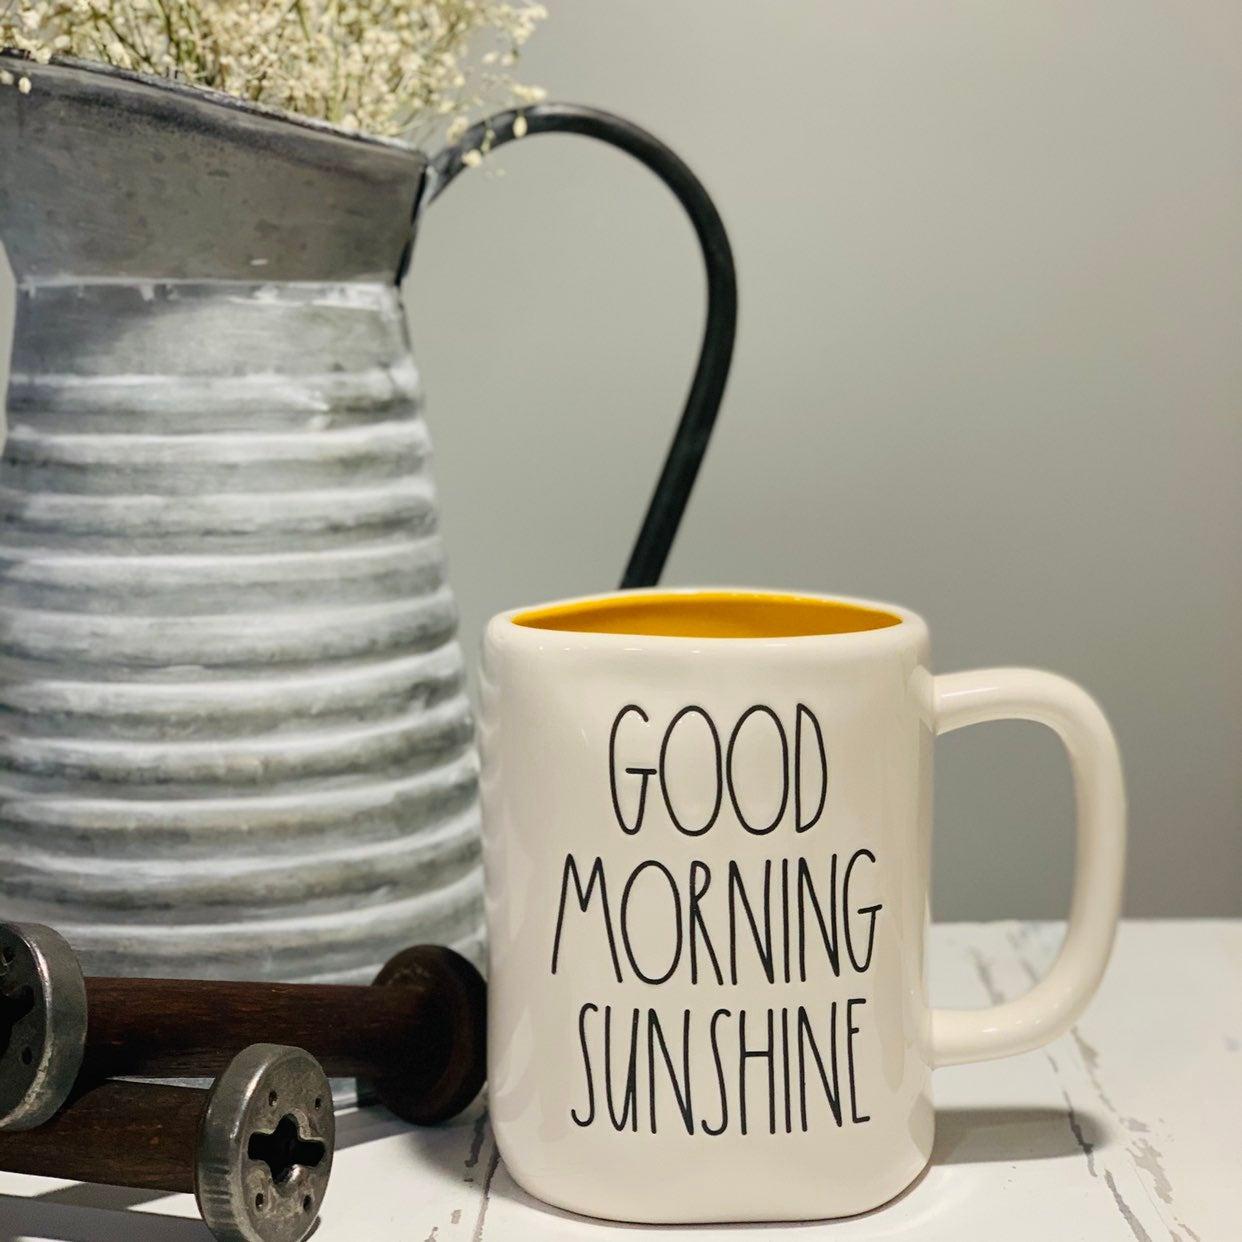 Rae Dunn Good Morning Sunshine Mug